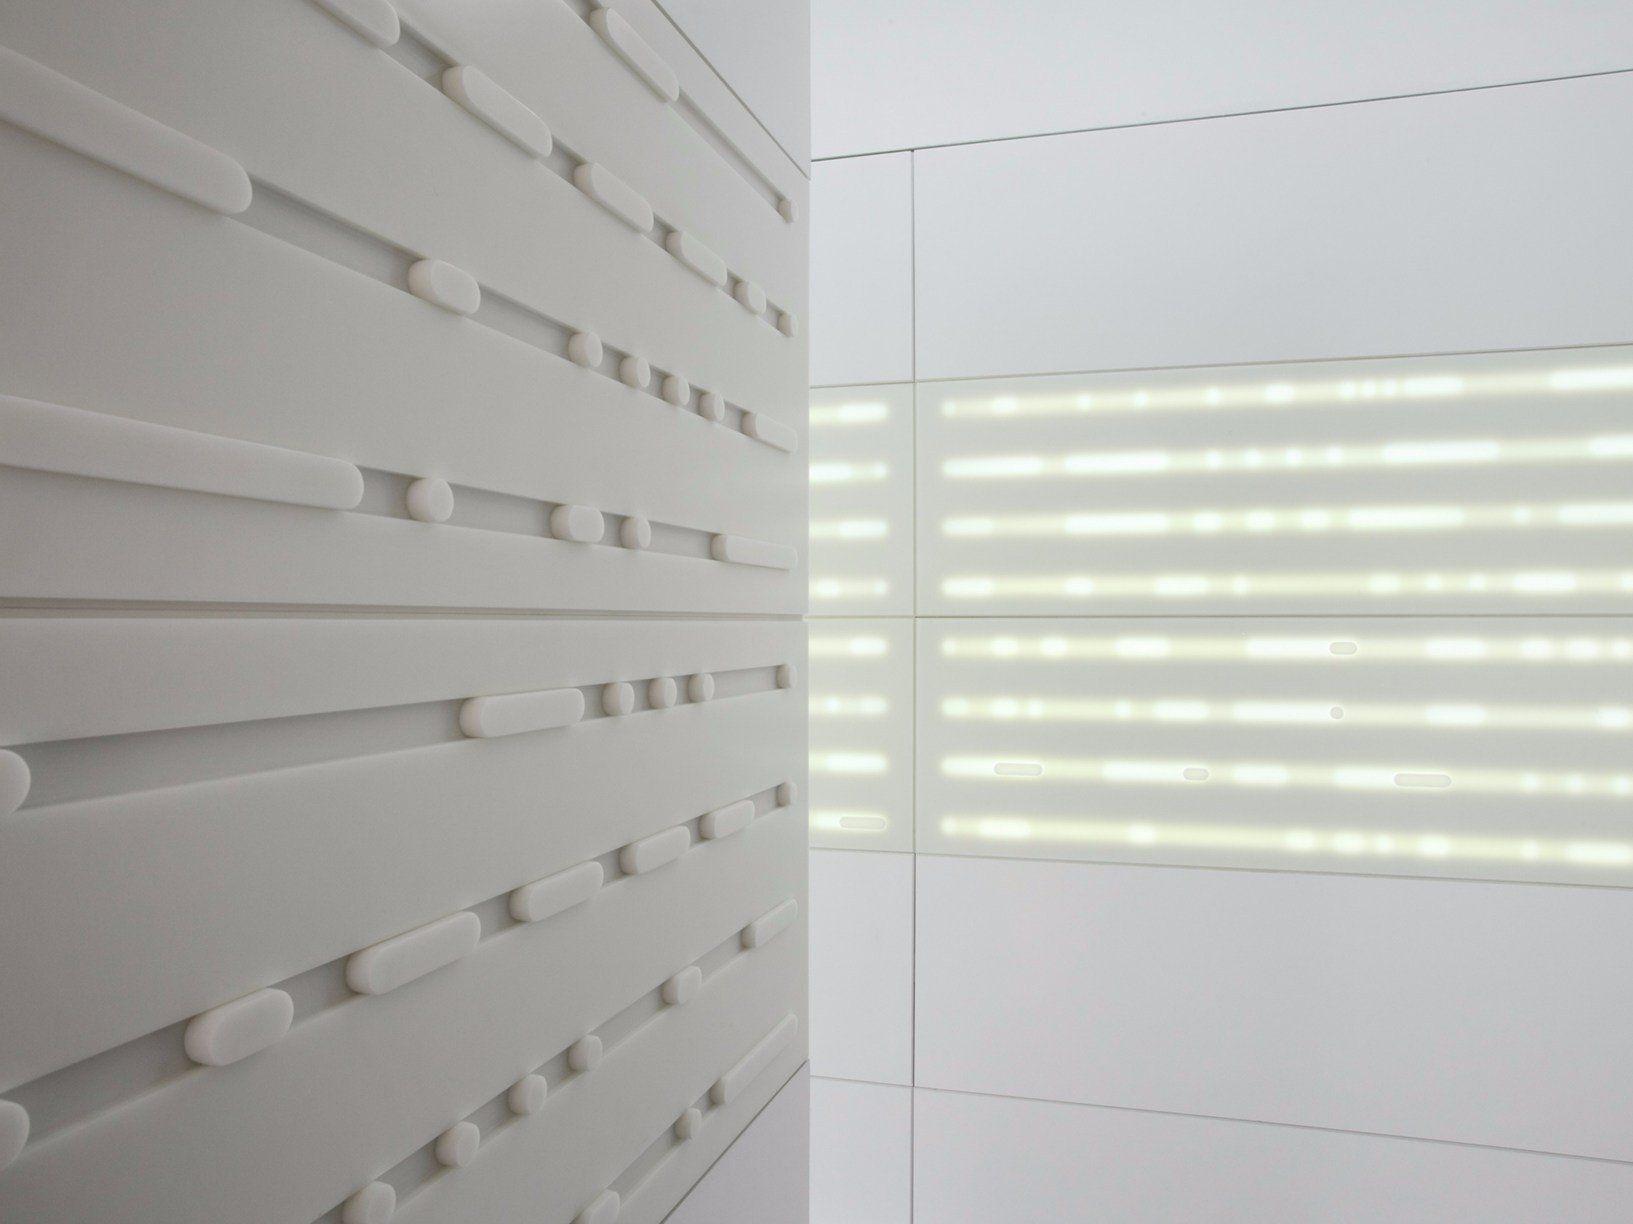 Superfici hi tech illuminazione led